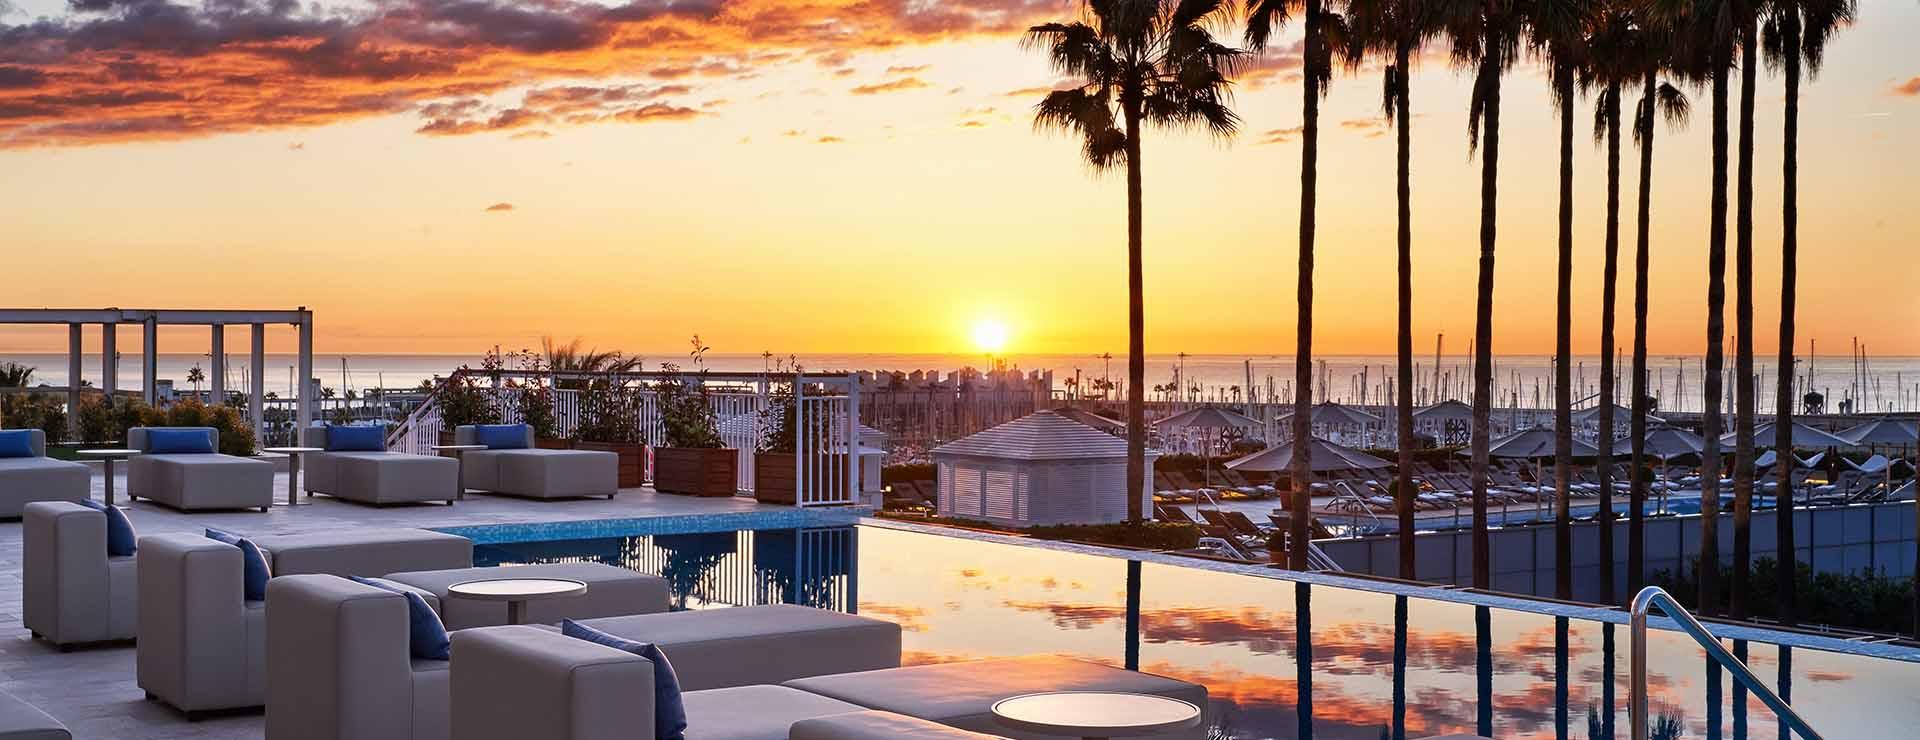 Infinity Pool and Lounge